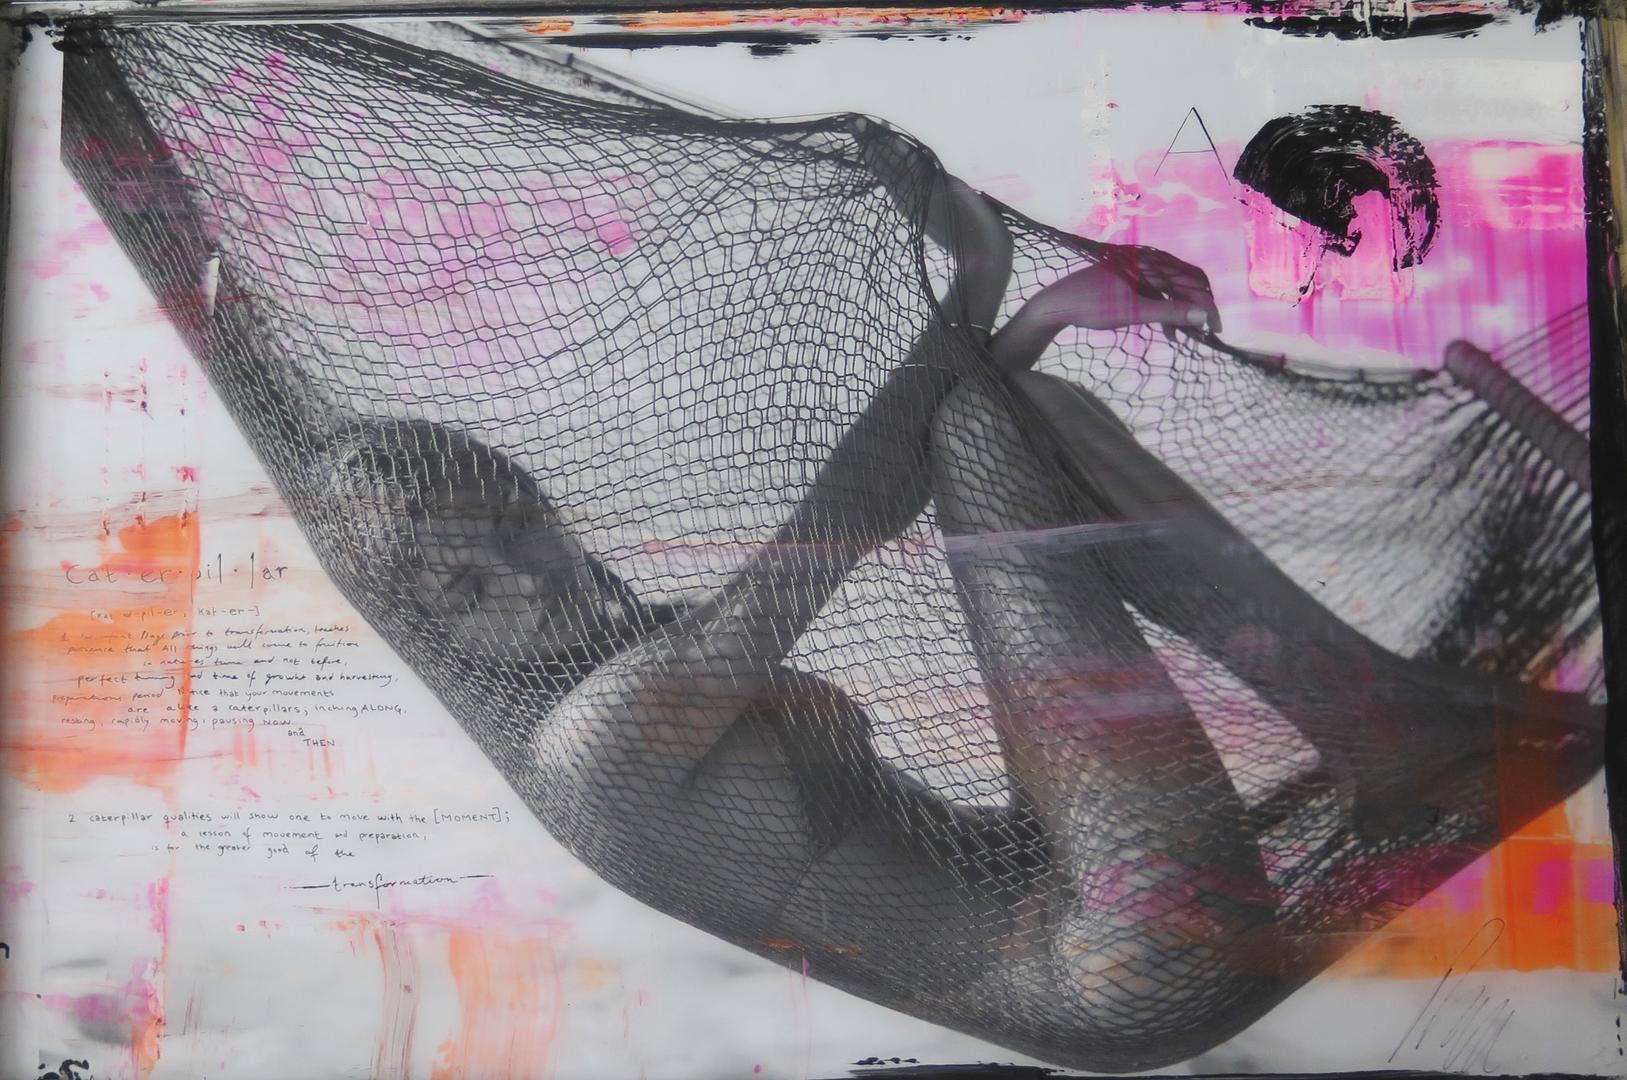 "Net,  2014. Archival print, ink, acrylic paint, encased in resin. 25 x 38""."